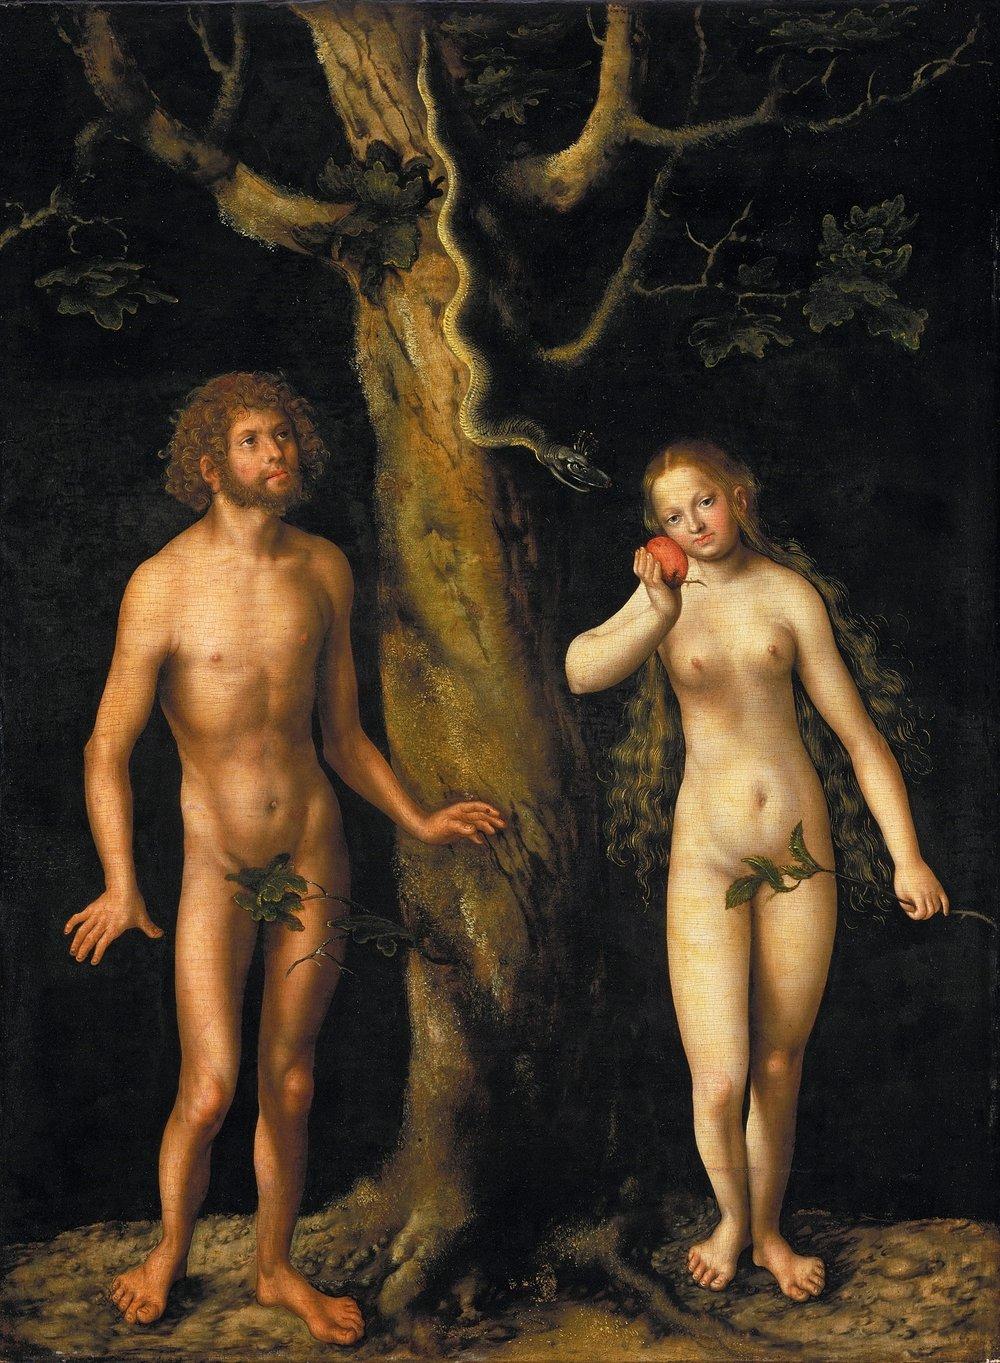 Adam and Eve in the Garden of Eden [Lucas Cranach the Elder [Public domain], via Wikimedia Commons